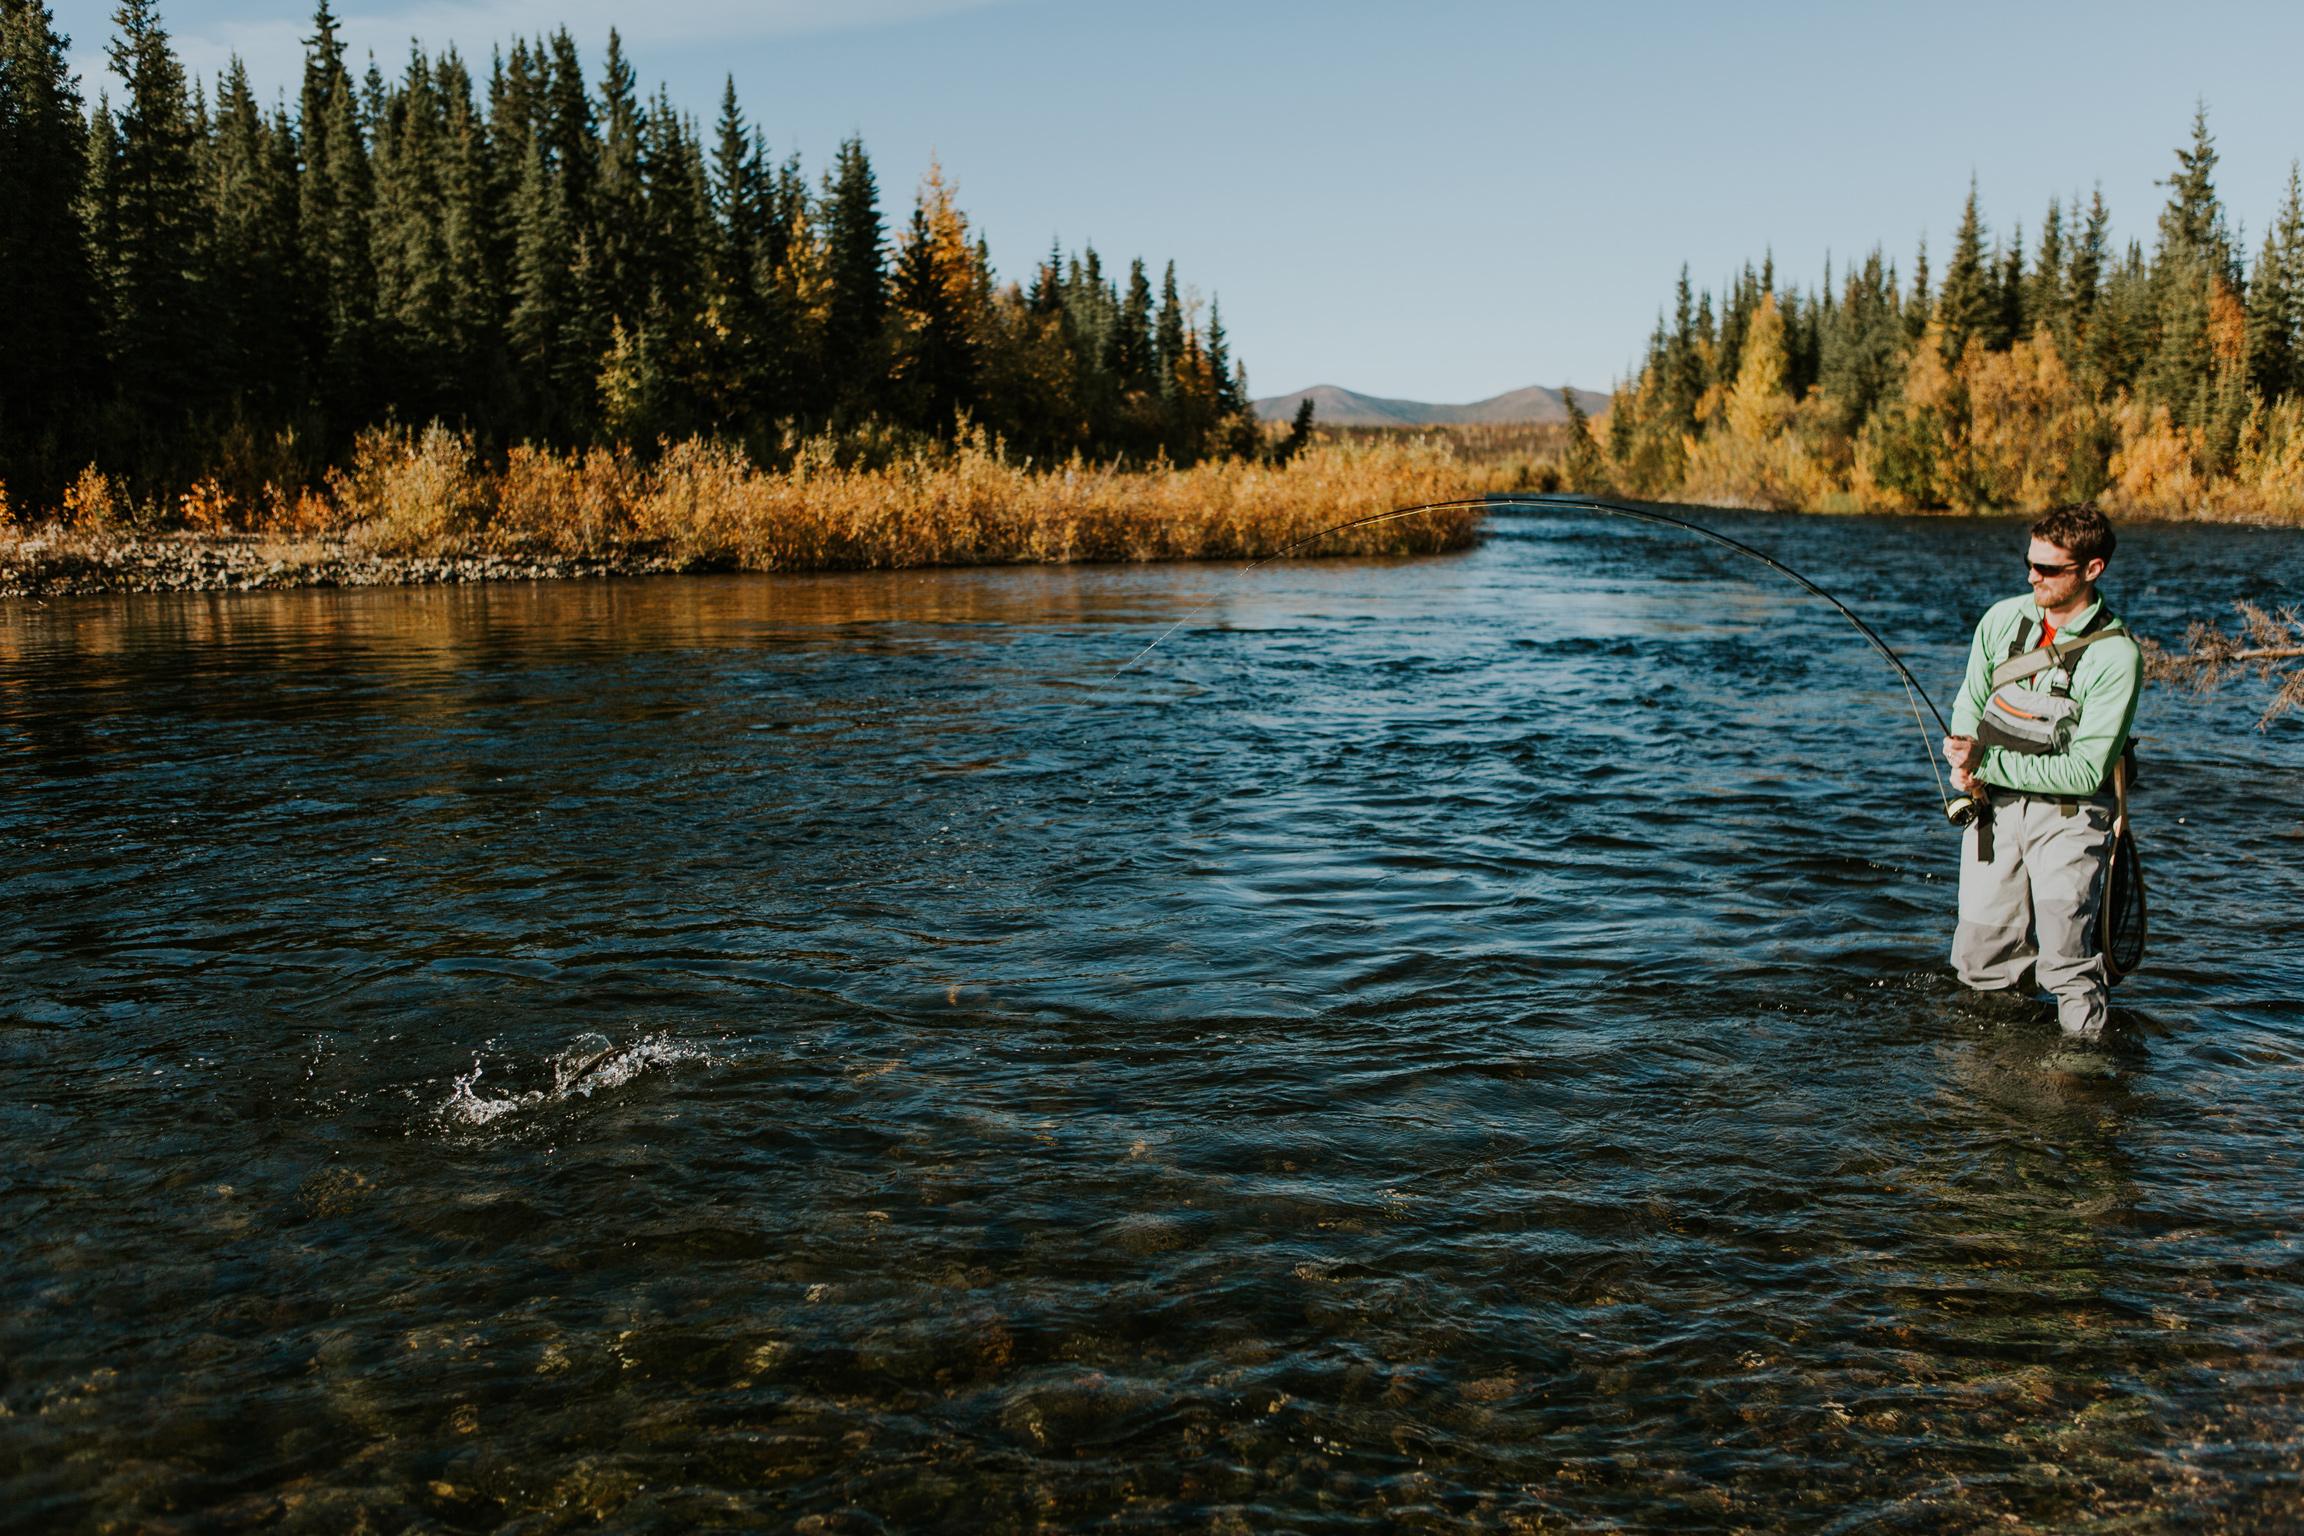 CindyGiovagnoli_Alaska_KoyukukRiver_SukakpakMountain_JimRiver_ArcticCircle_fly_fishing_September-068.jpg